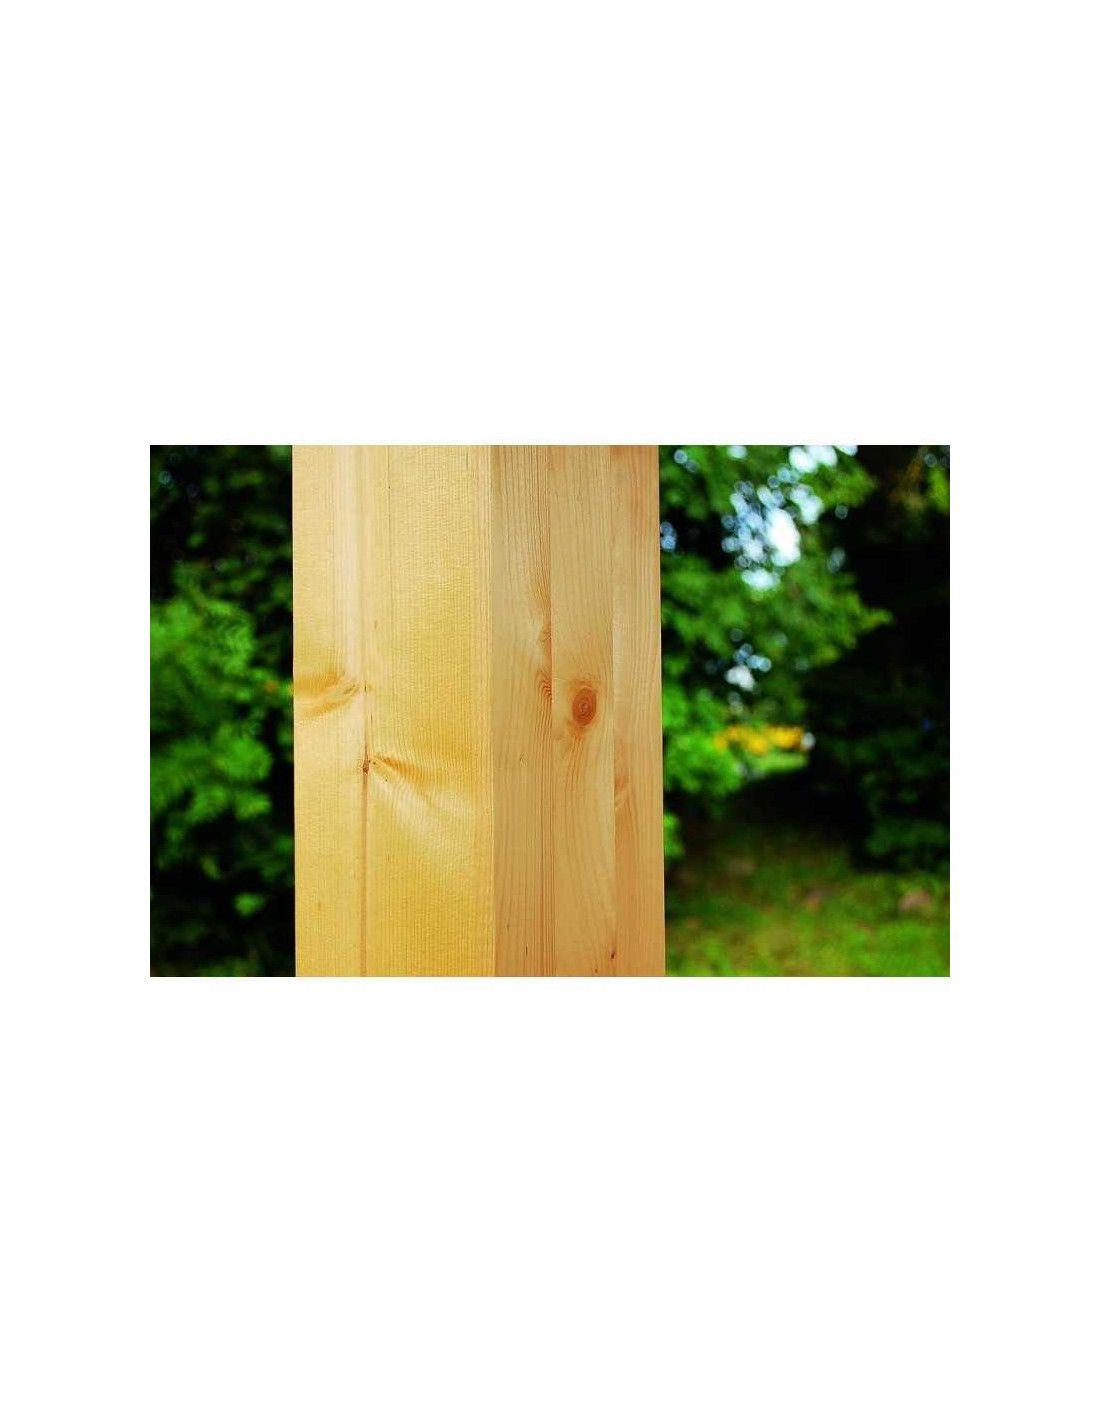 P rgola de madera 11 7 m - Postes de madera para pergolas ...